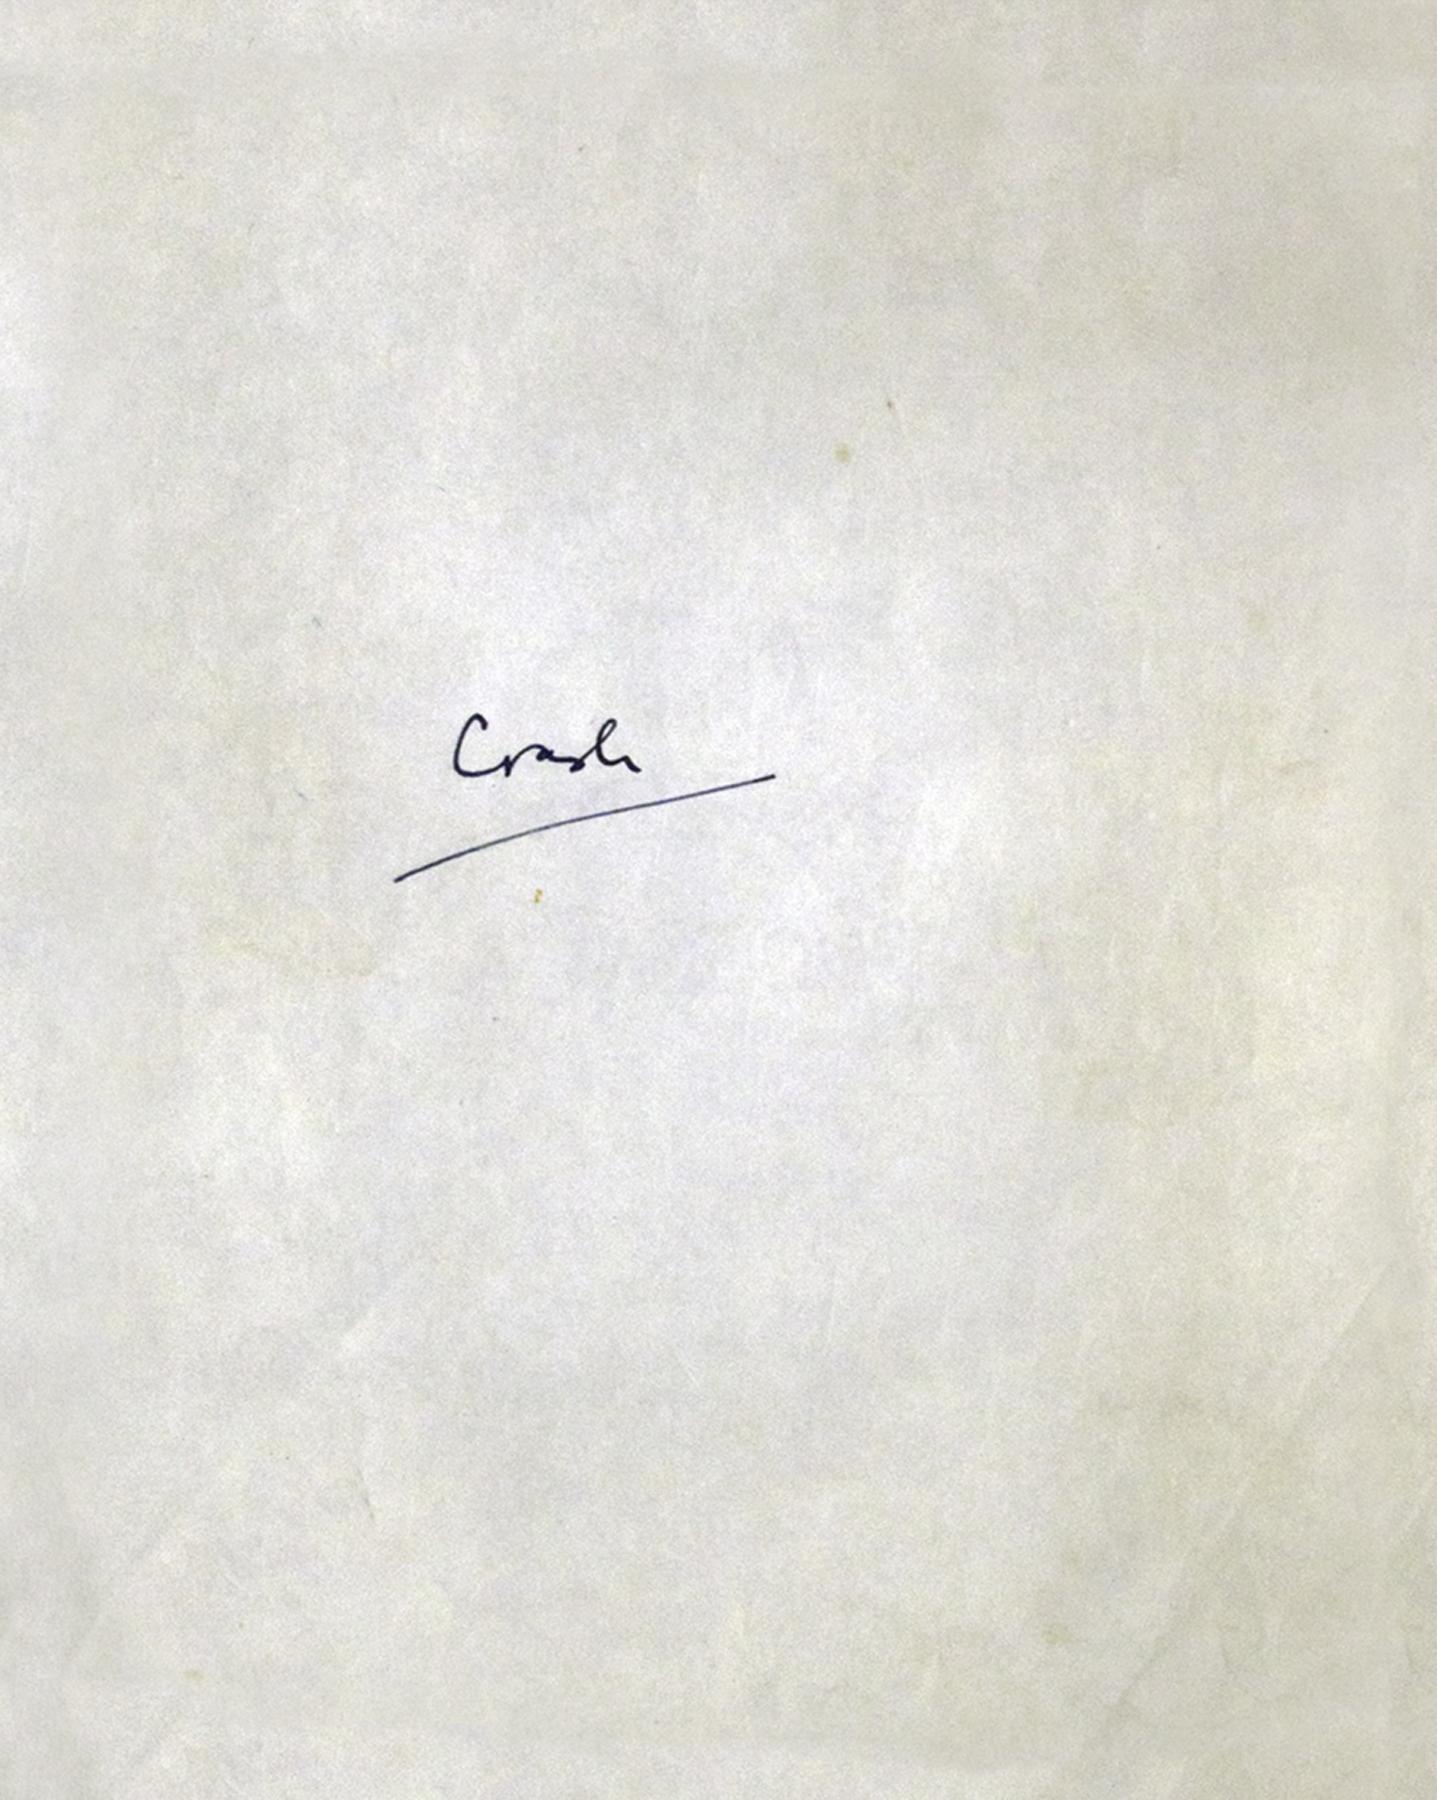 Chris Beckett Crash: The Collector's Edition nunn h p v henry preston vaughan a short syntax of new testament greek